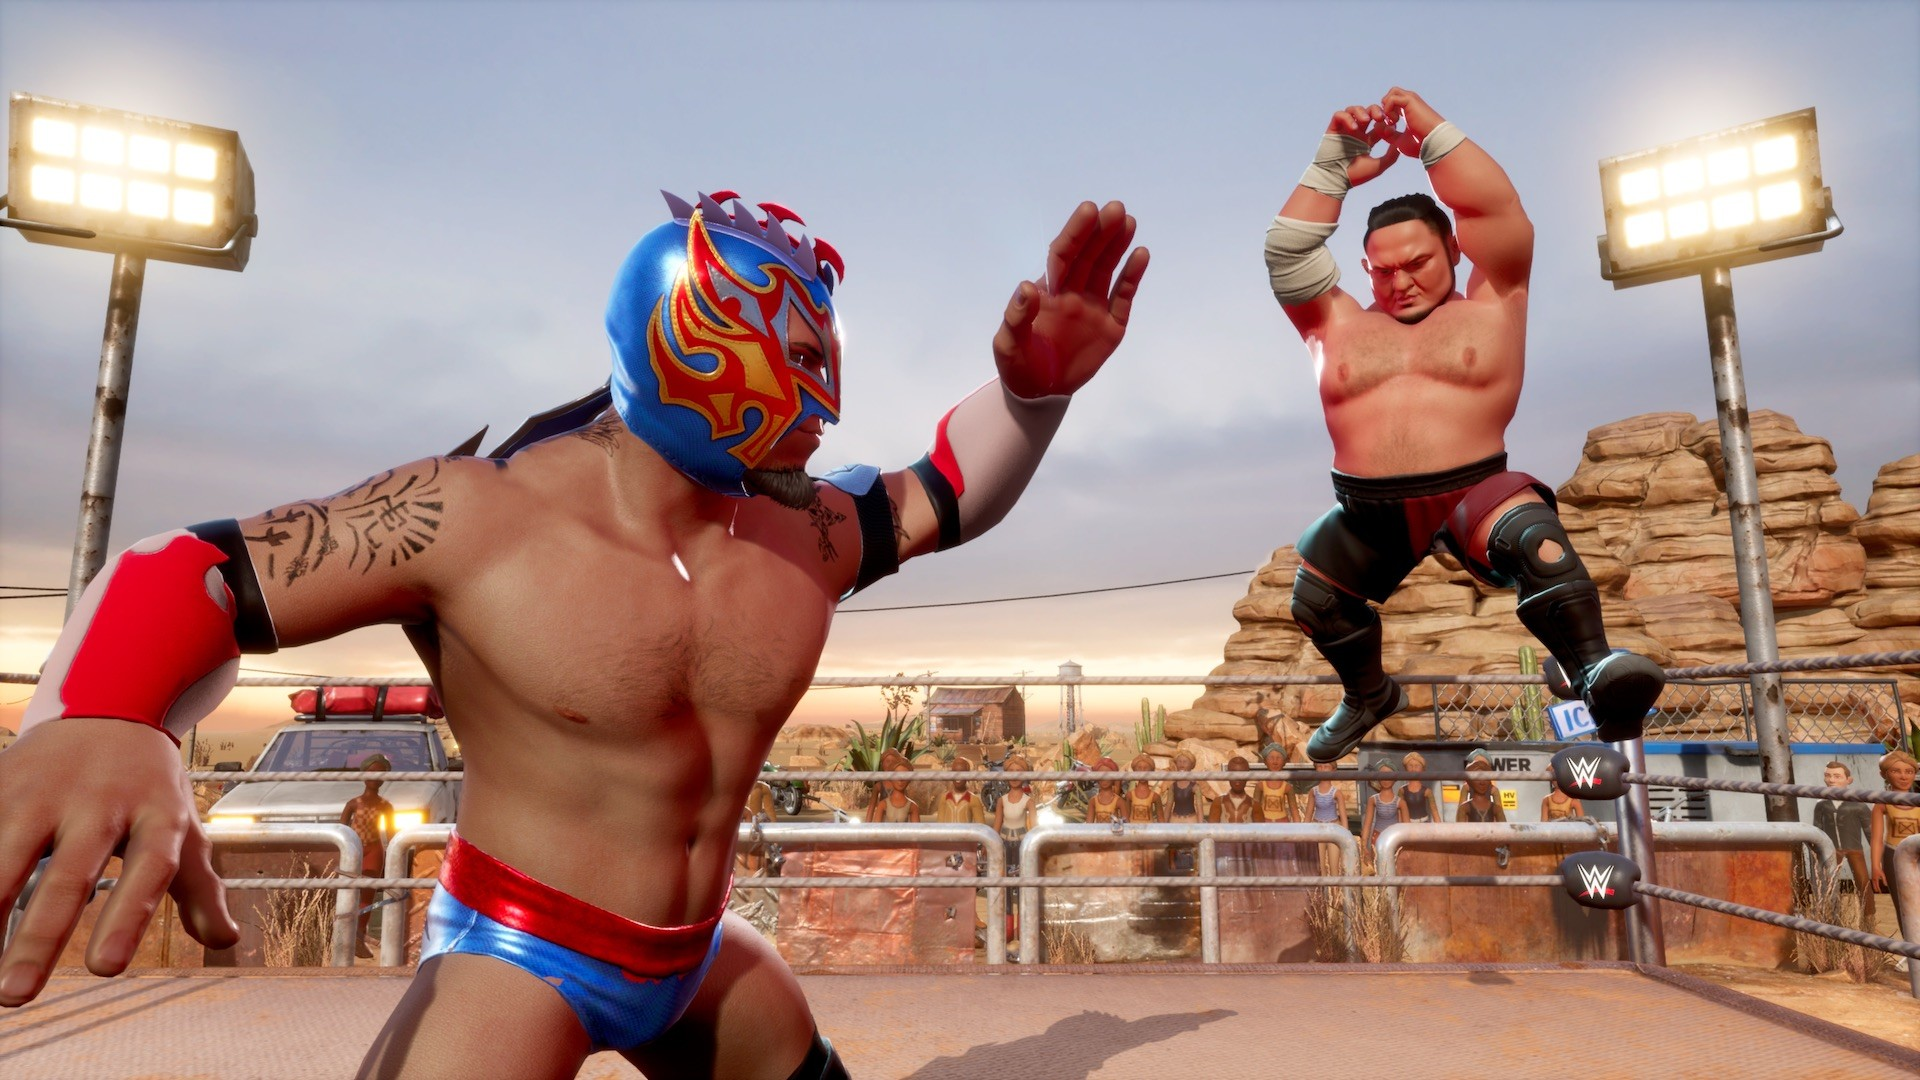 Screenshot for the game WWE 2K Battlegrounds [1.0.3.0] (2020) download torrent RePack